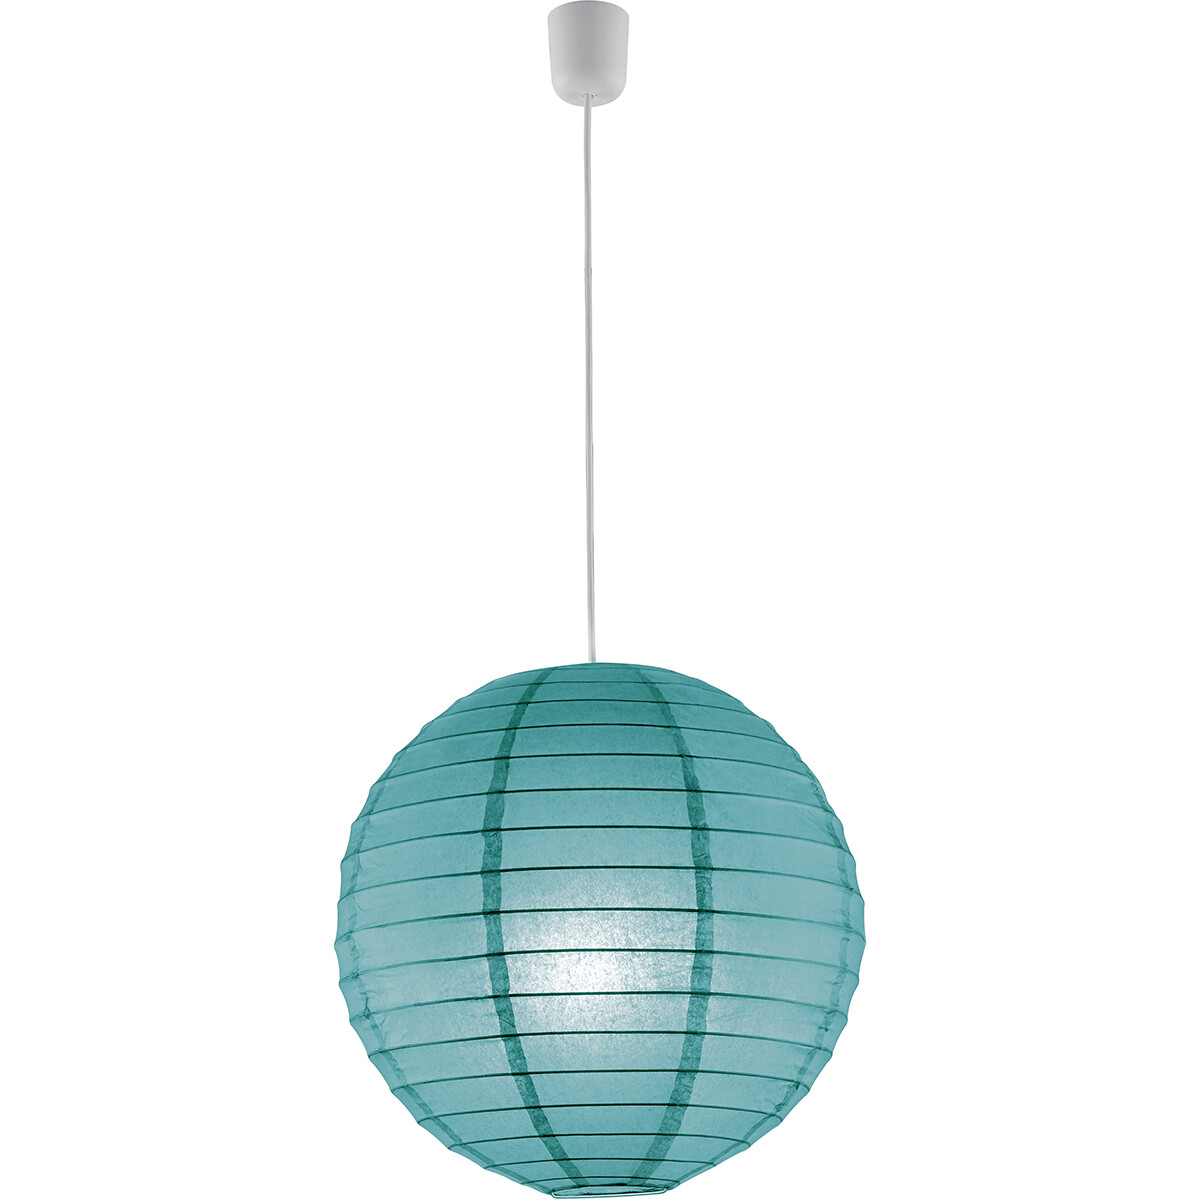 LED Hanglamp - Hangverlichting - Trion Ponton - Rond - Mat Turquoise - Papier